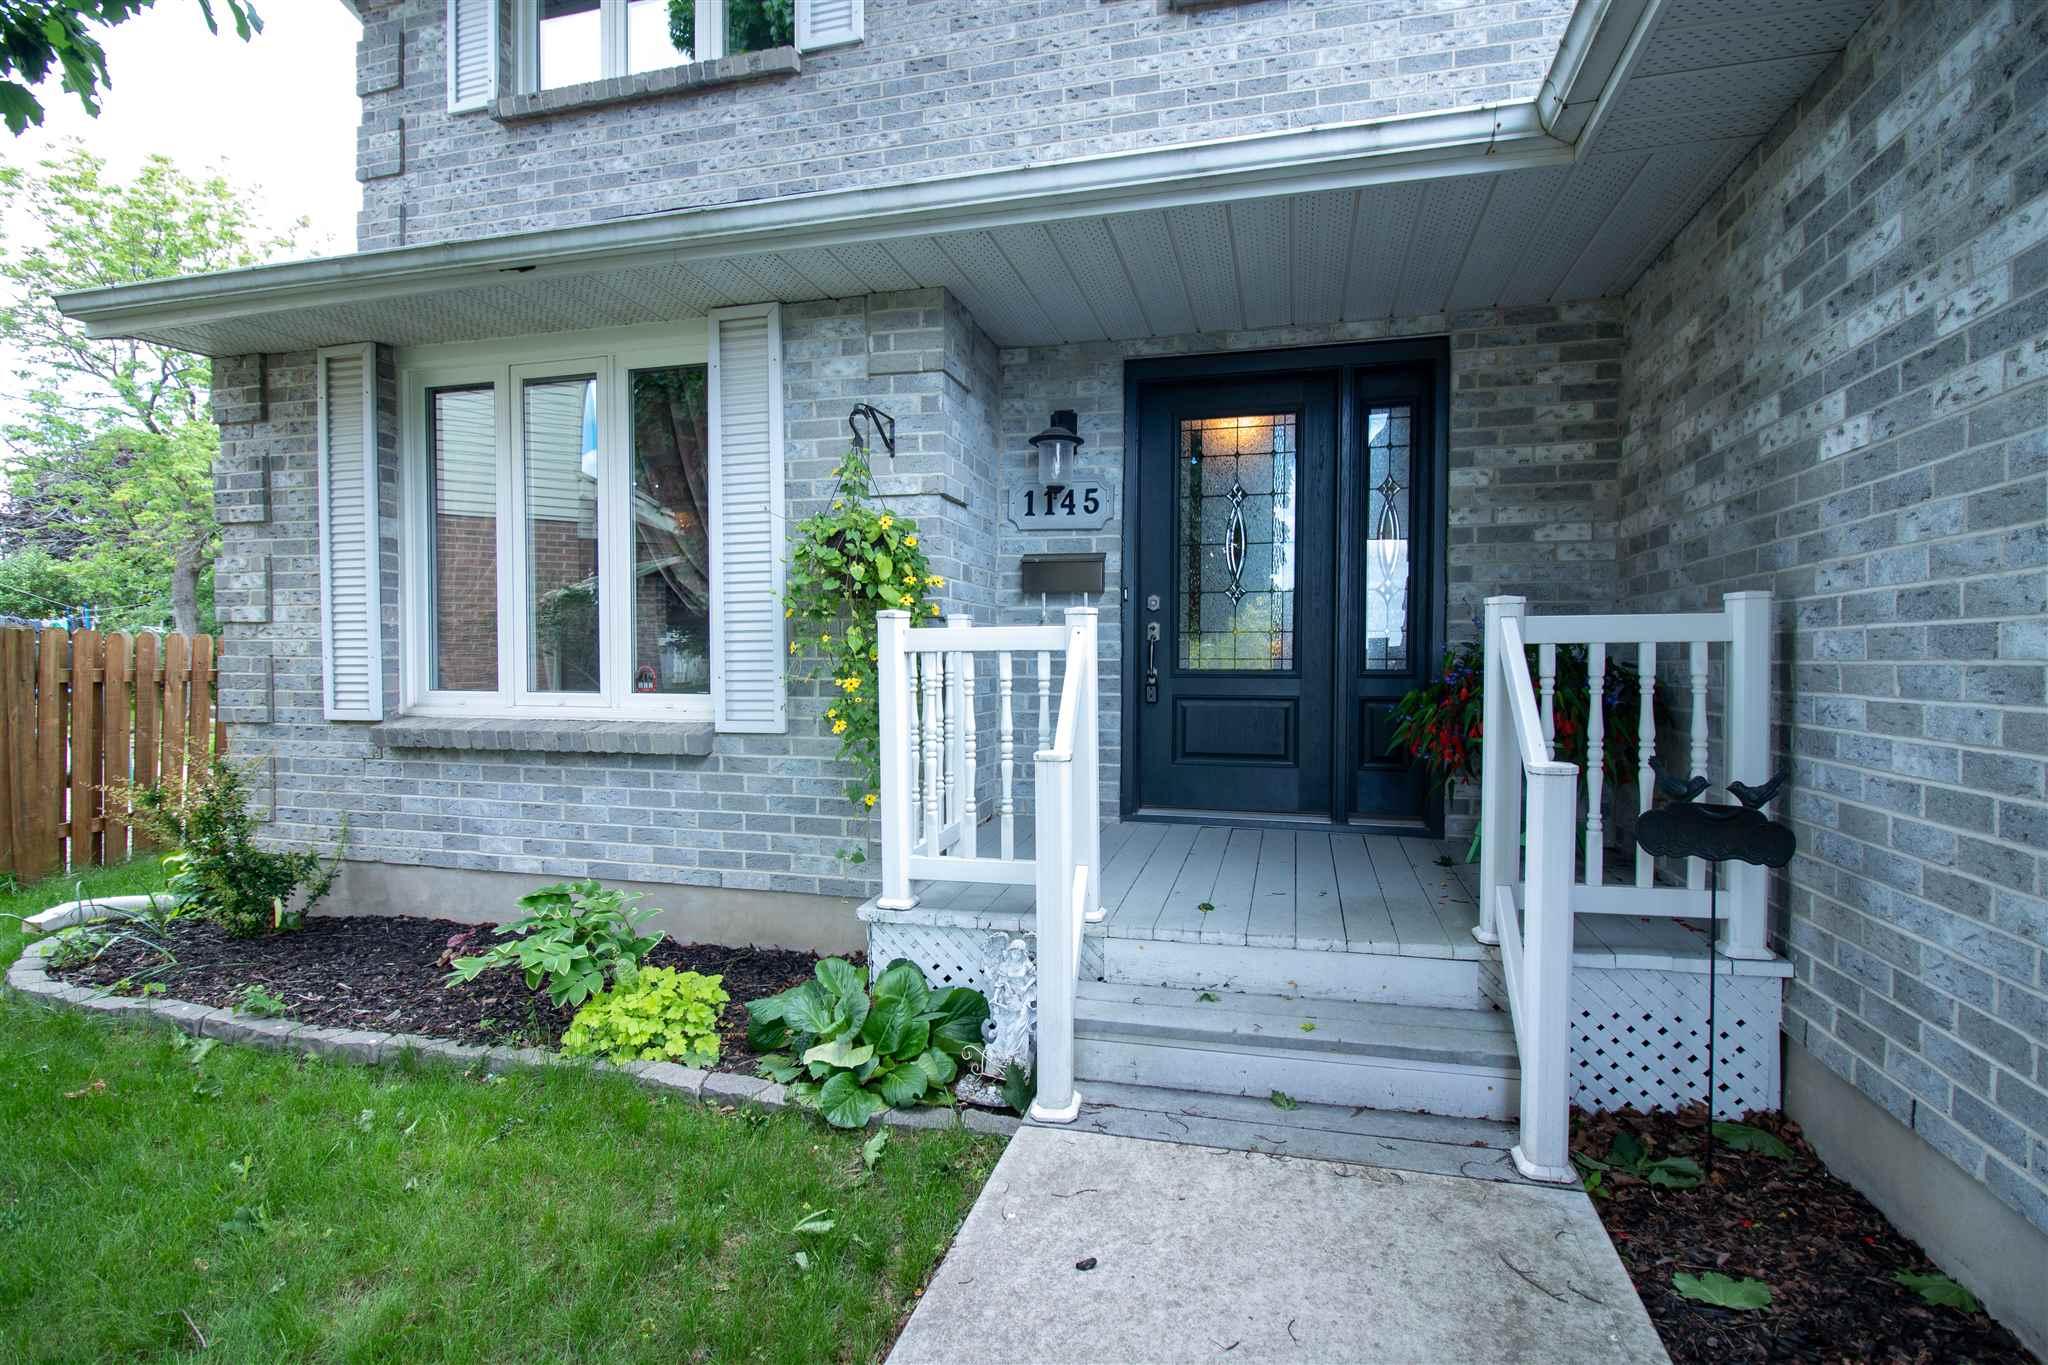 1145 Wintergreen Crescent, Kingston Ontario, Canada